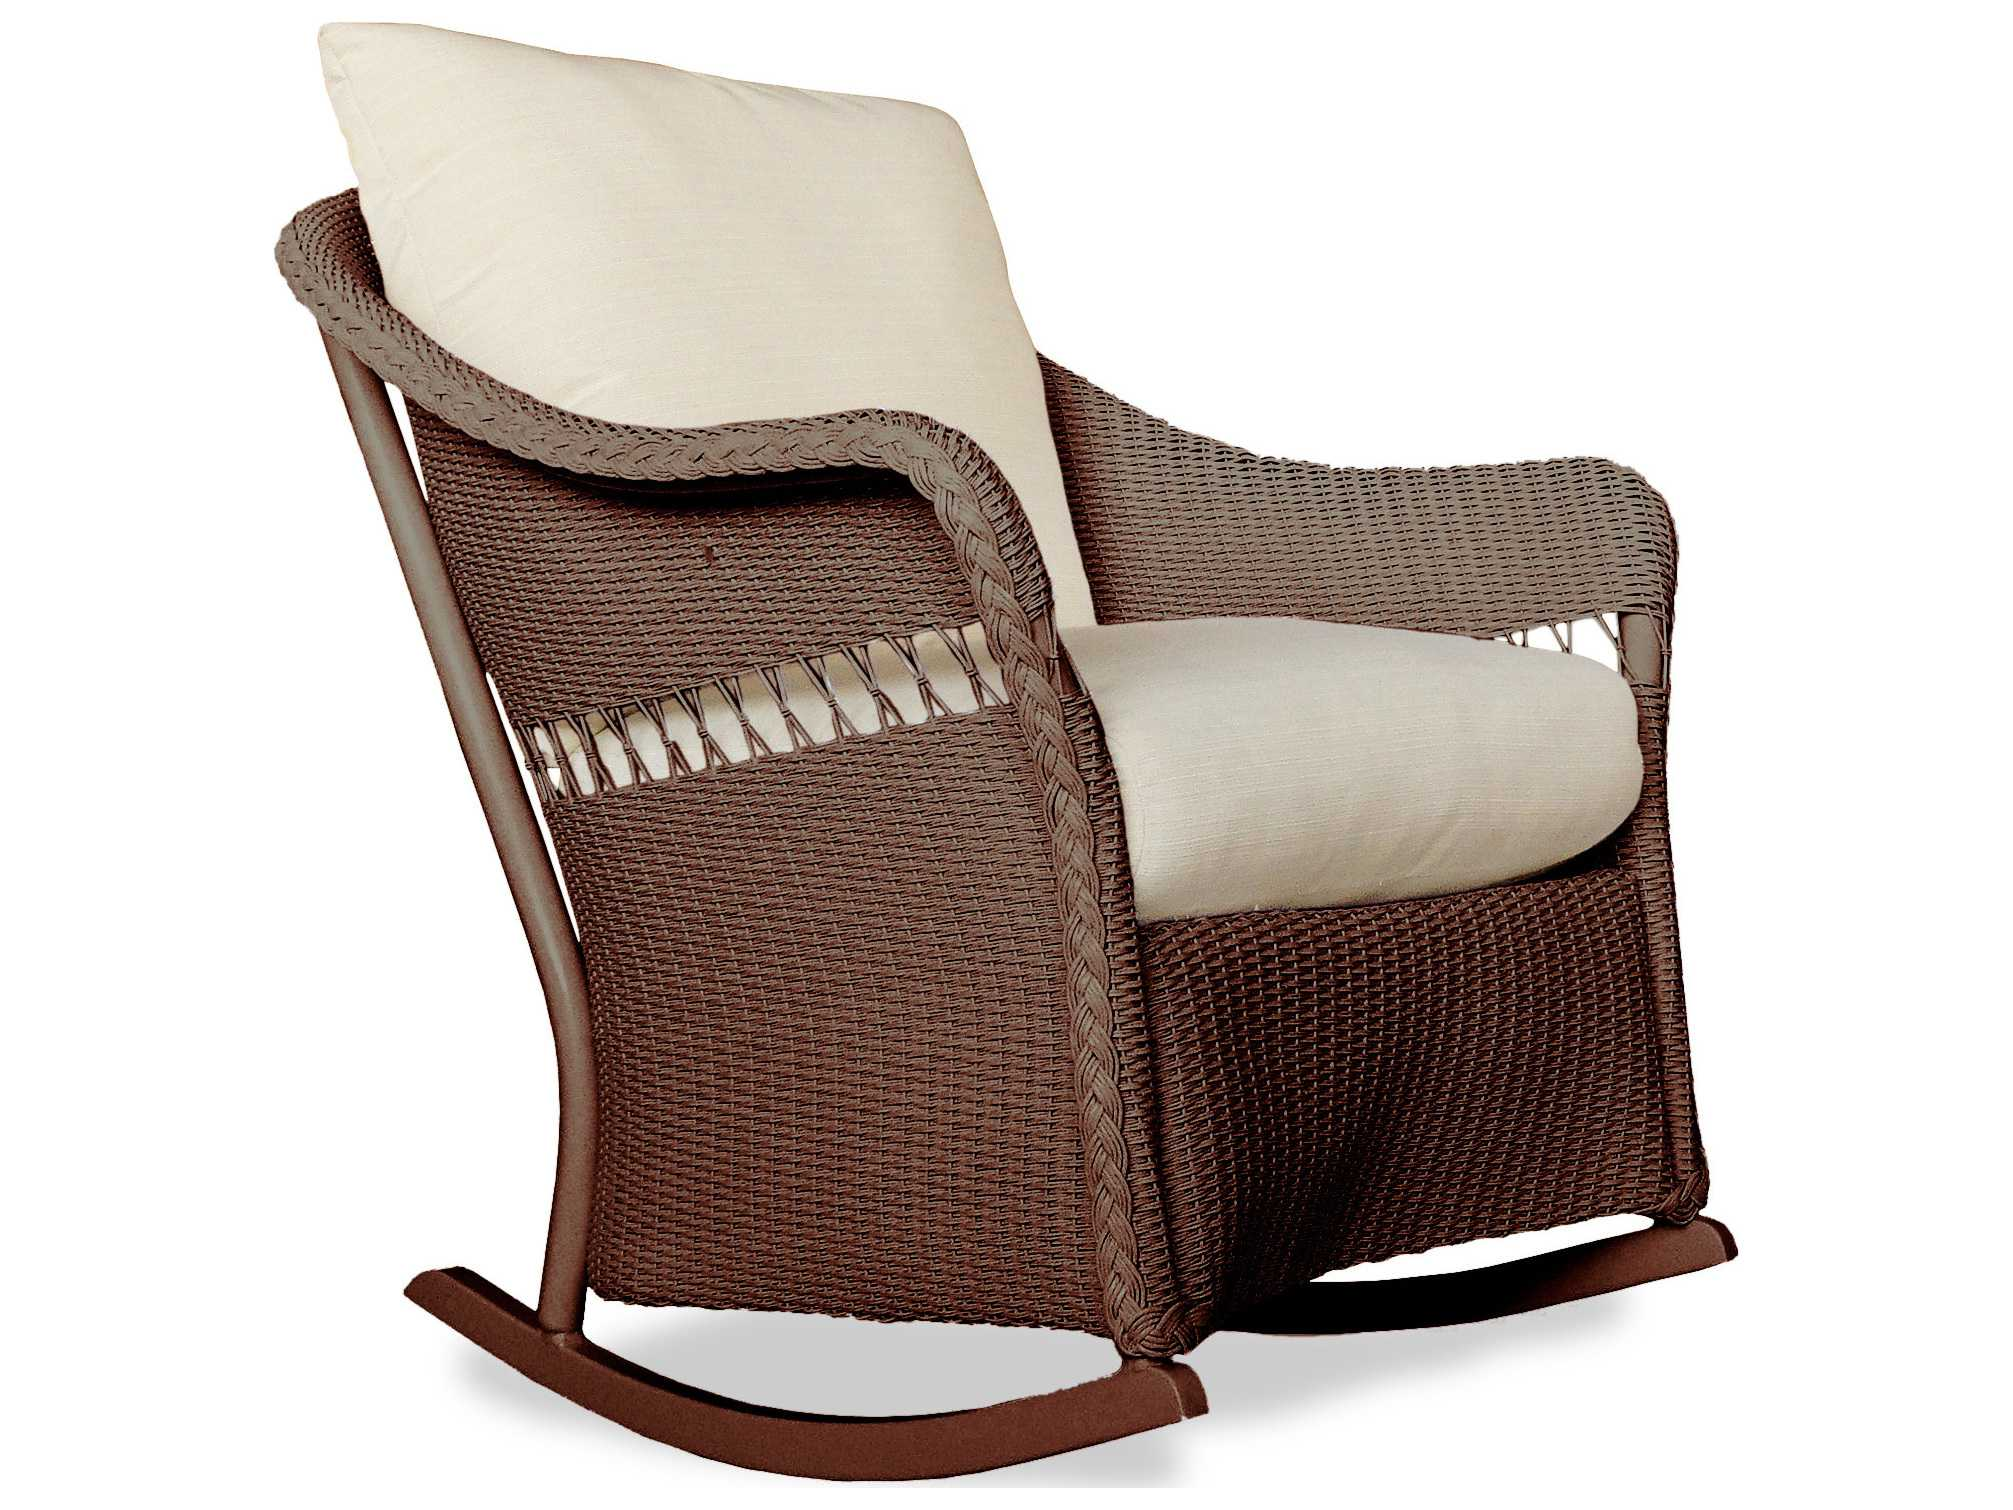 Lloyd Flanders Freeport Wicker Lounge Set Frelngeset